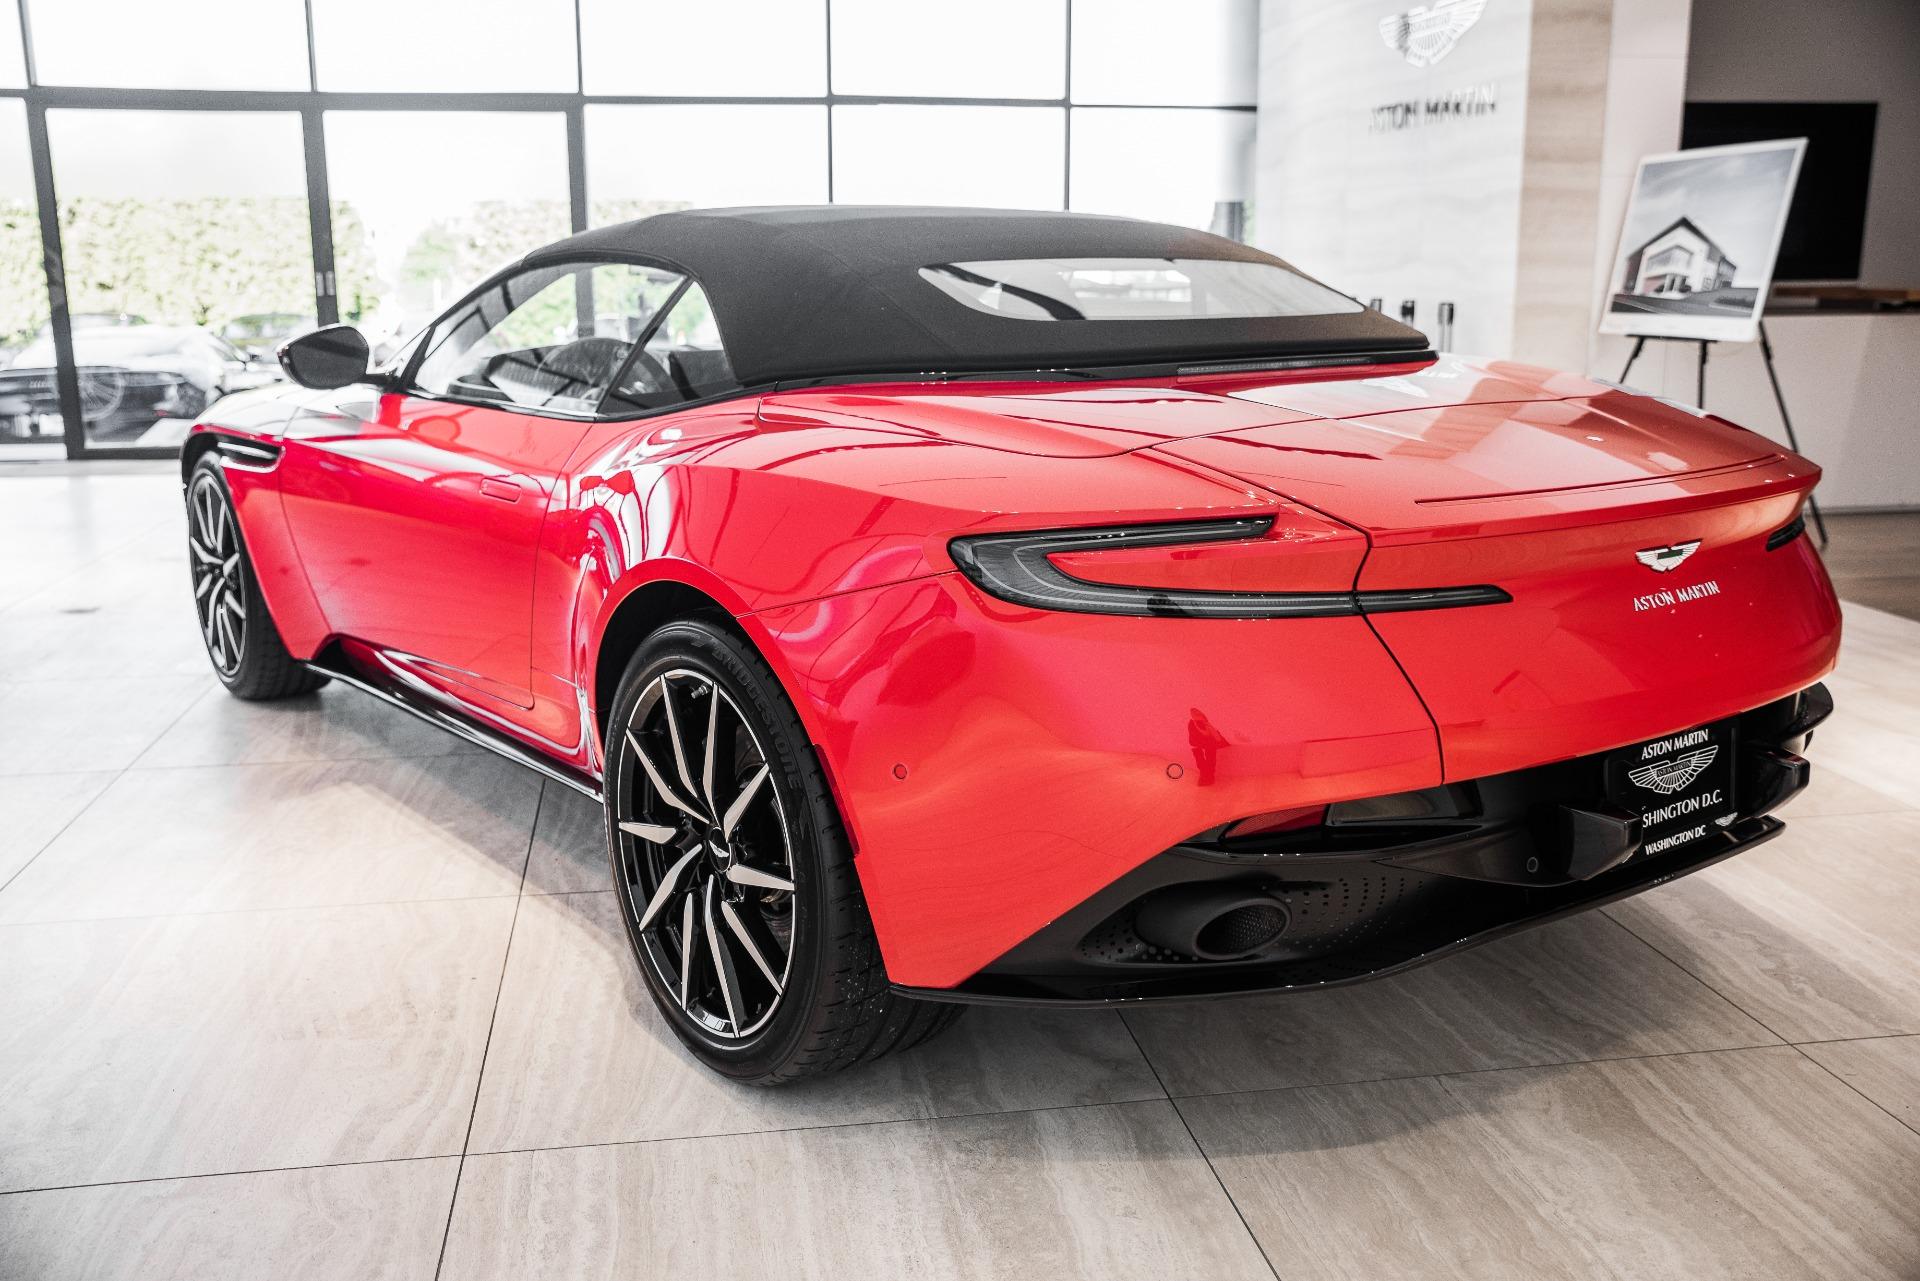 2020 Aston Martin Db11 Volante Stock P157540a For Sale Near Vienna Va Va Aston Martin Dealer